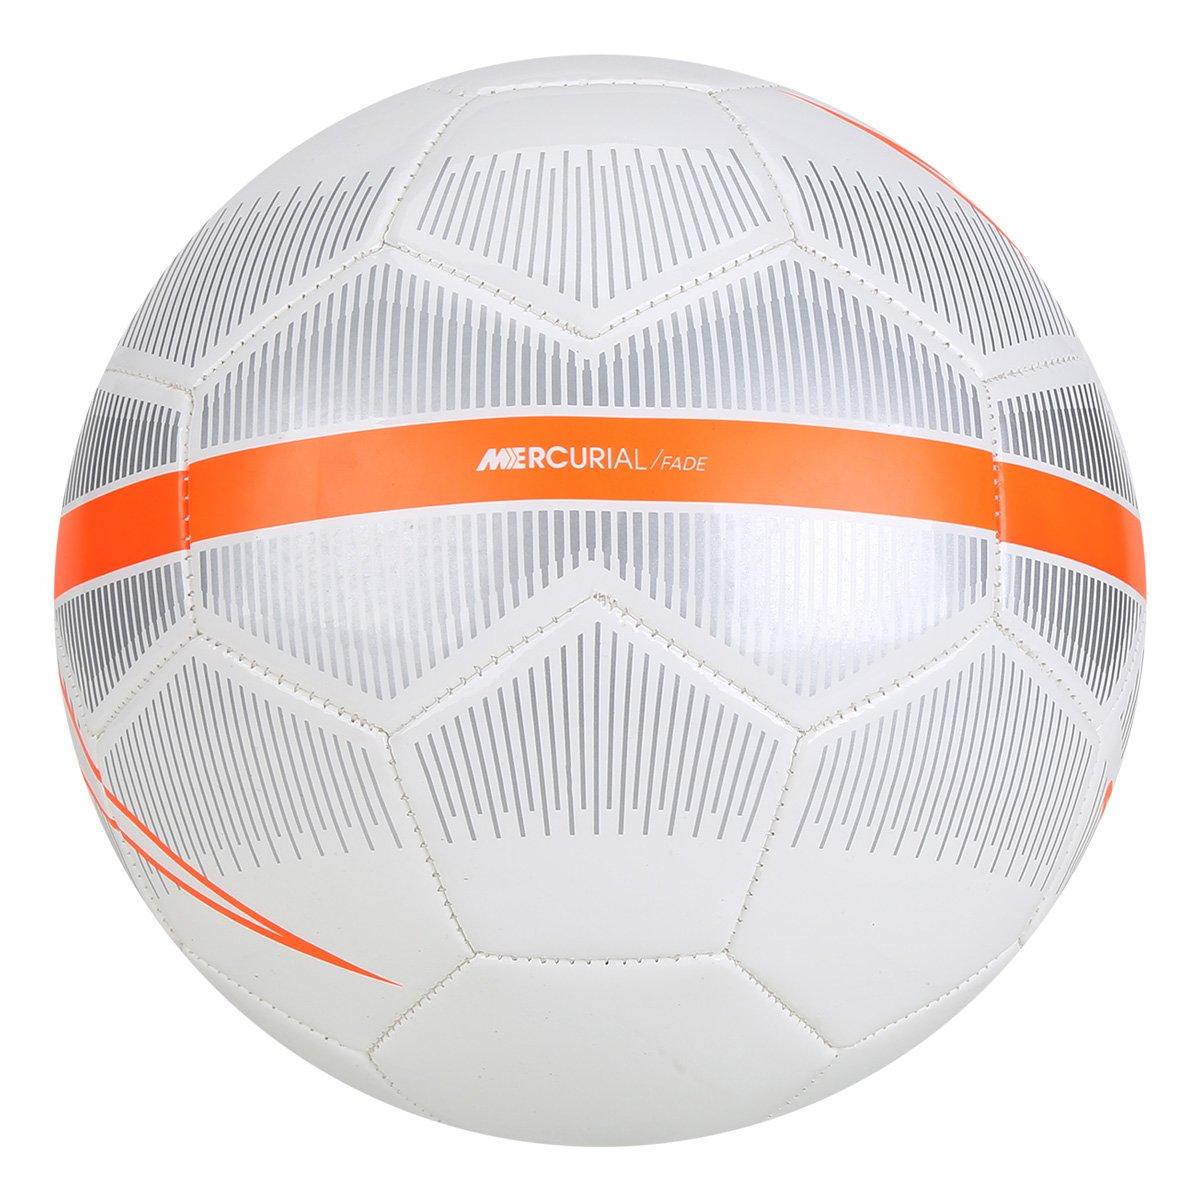 c61323eeef Bola Futebol Campo Nike Mercurial Fade - Branco e Cinza - Compre ...